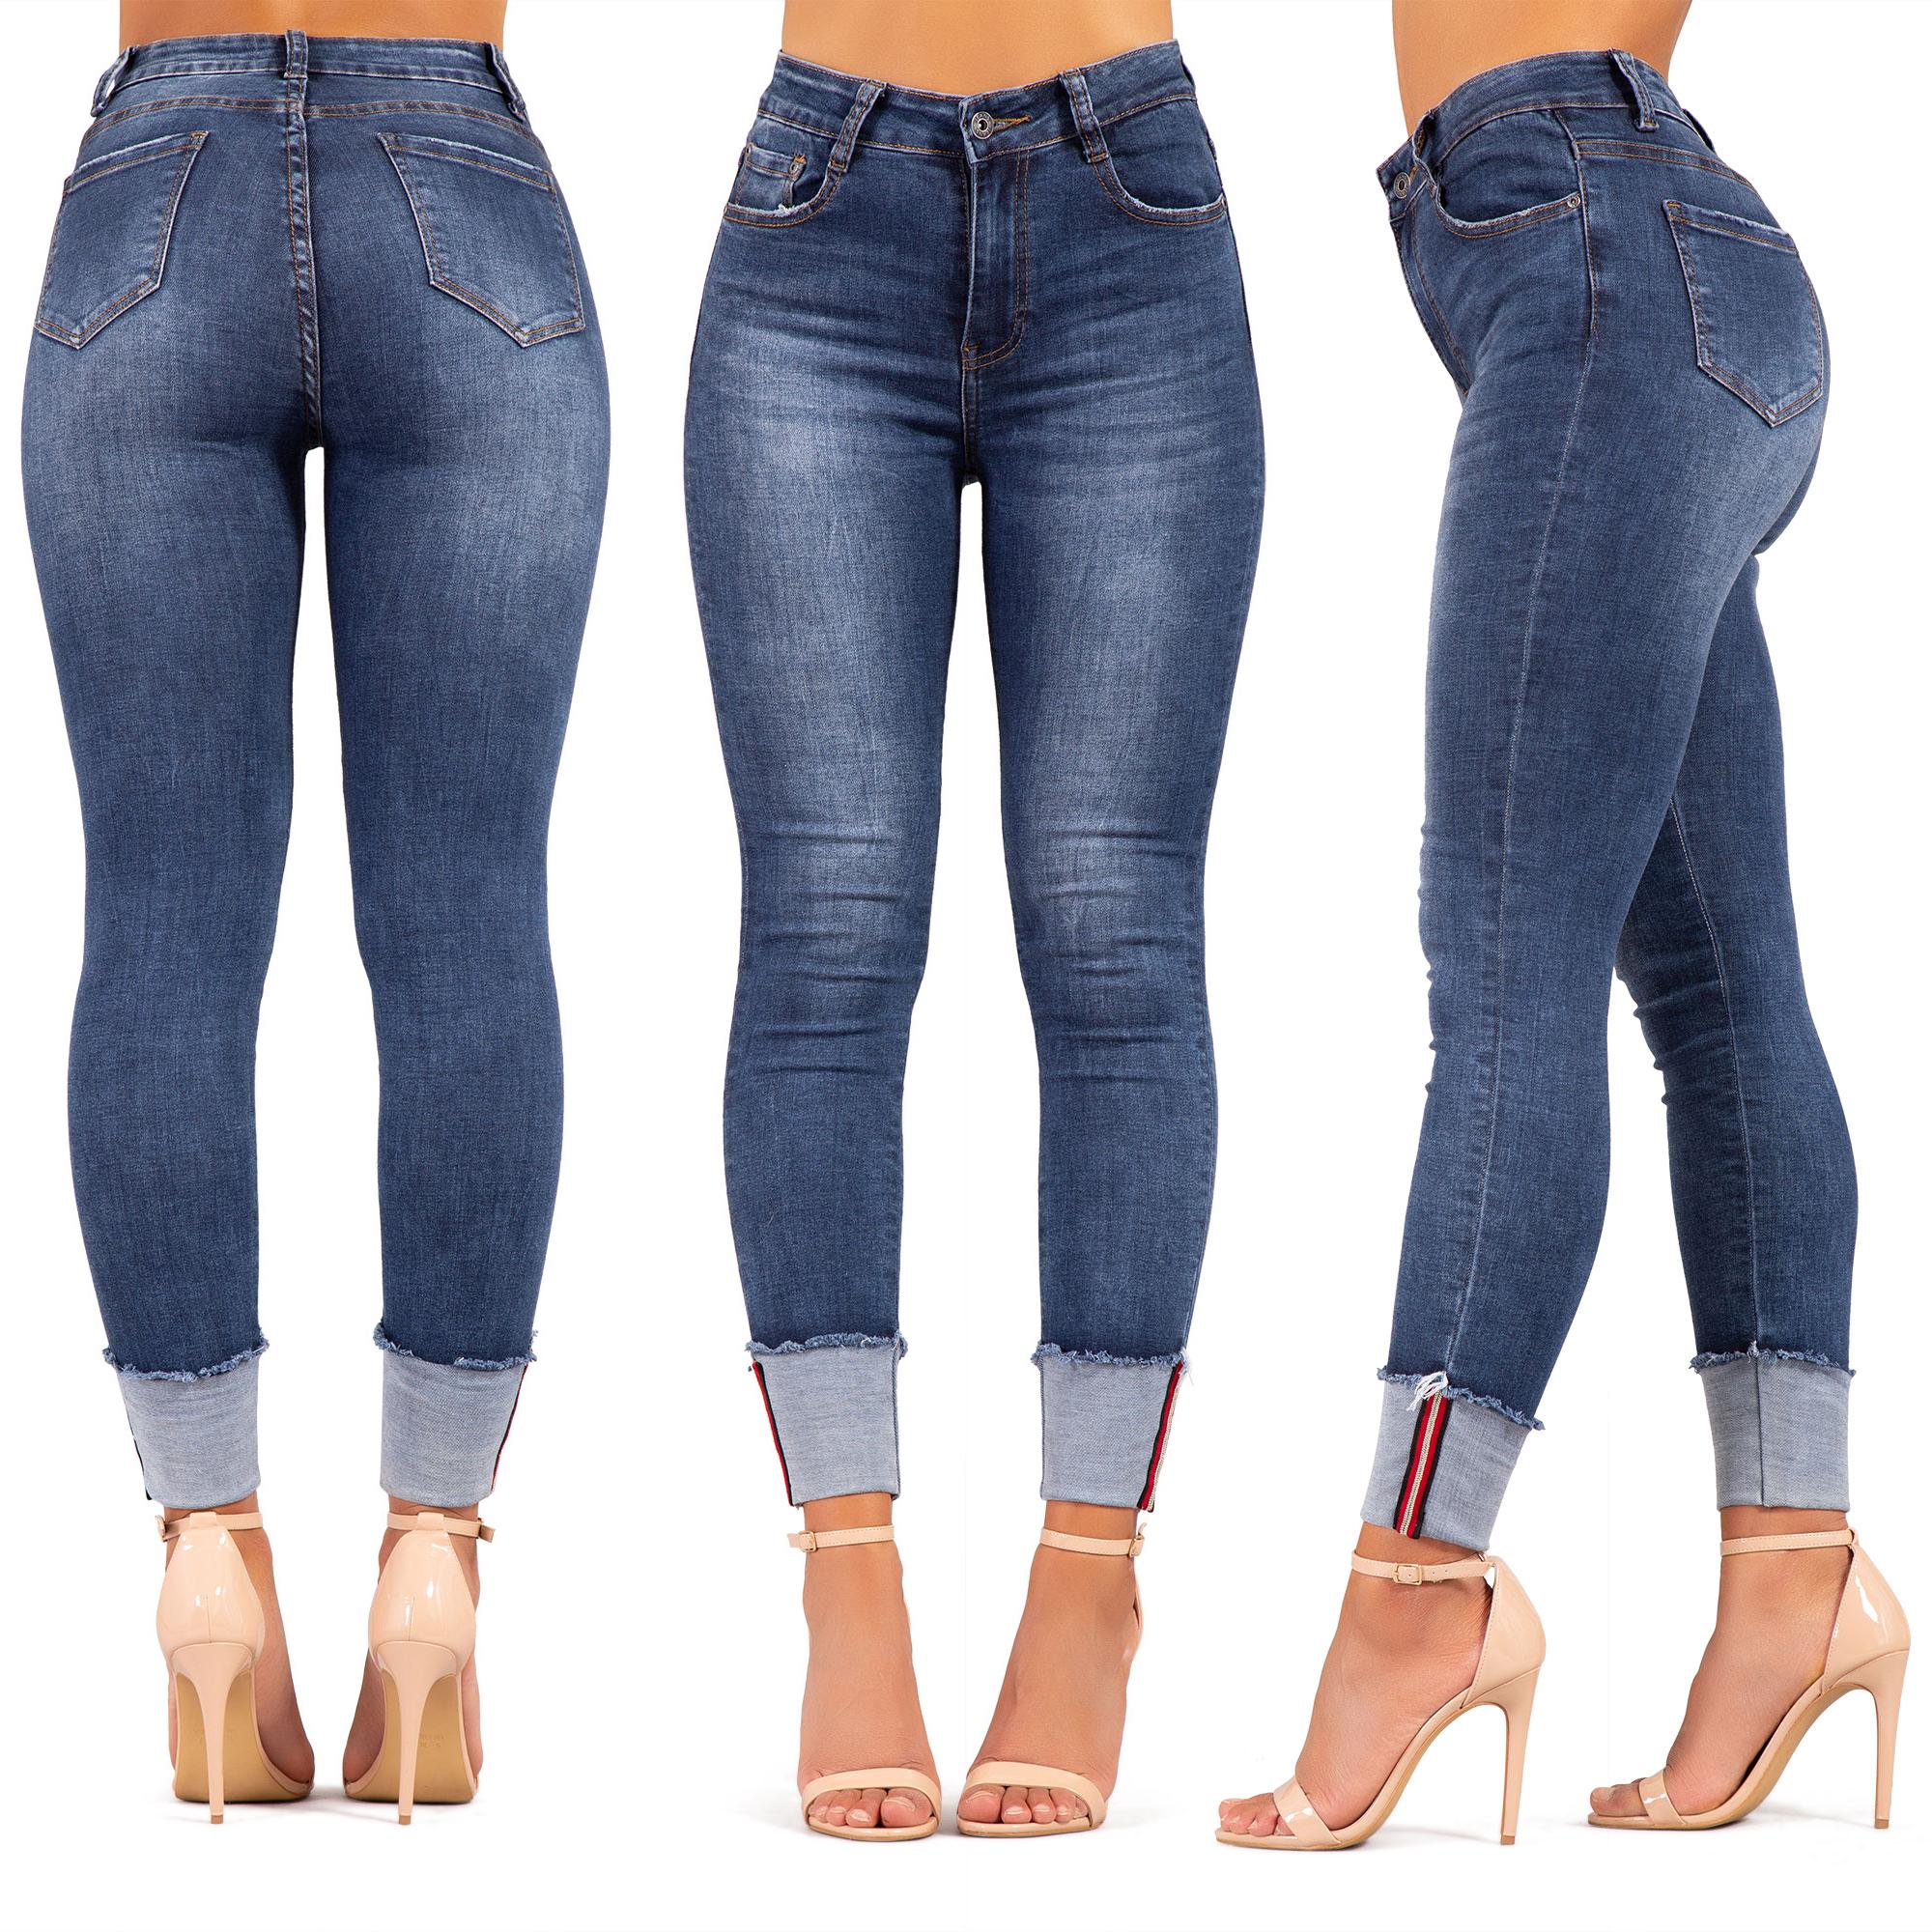 Womens High Waist Jeans Ladies Denim Skinny Jeans Stretch Jeggings Size 6-14